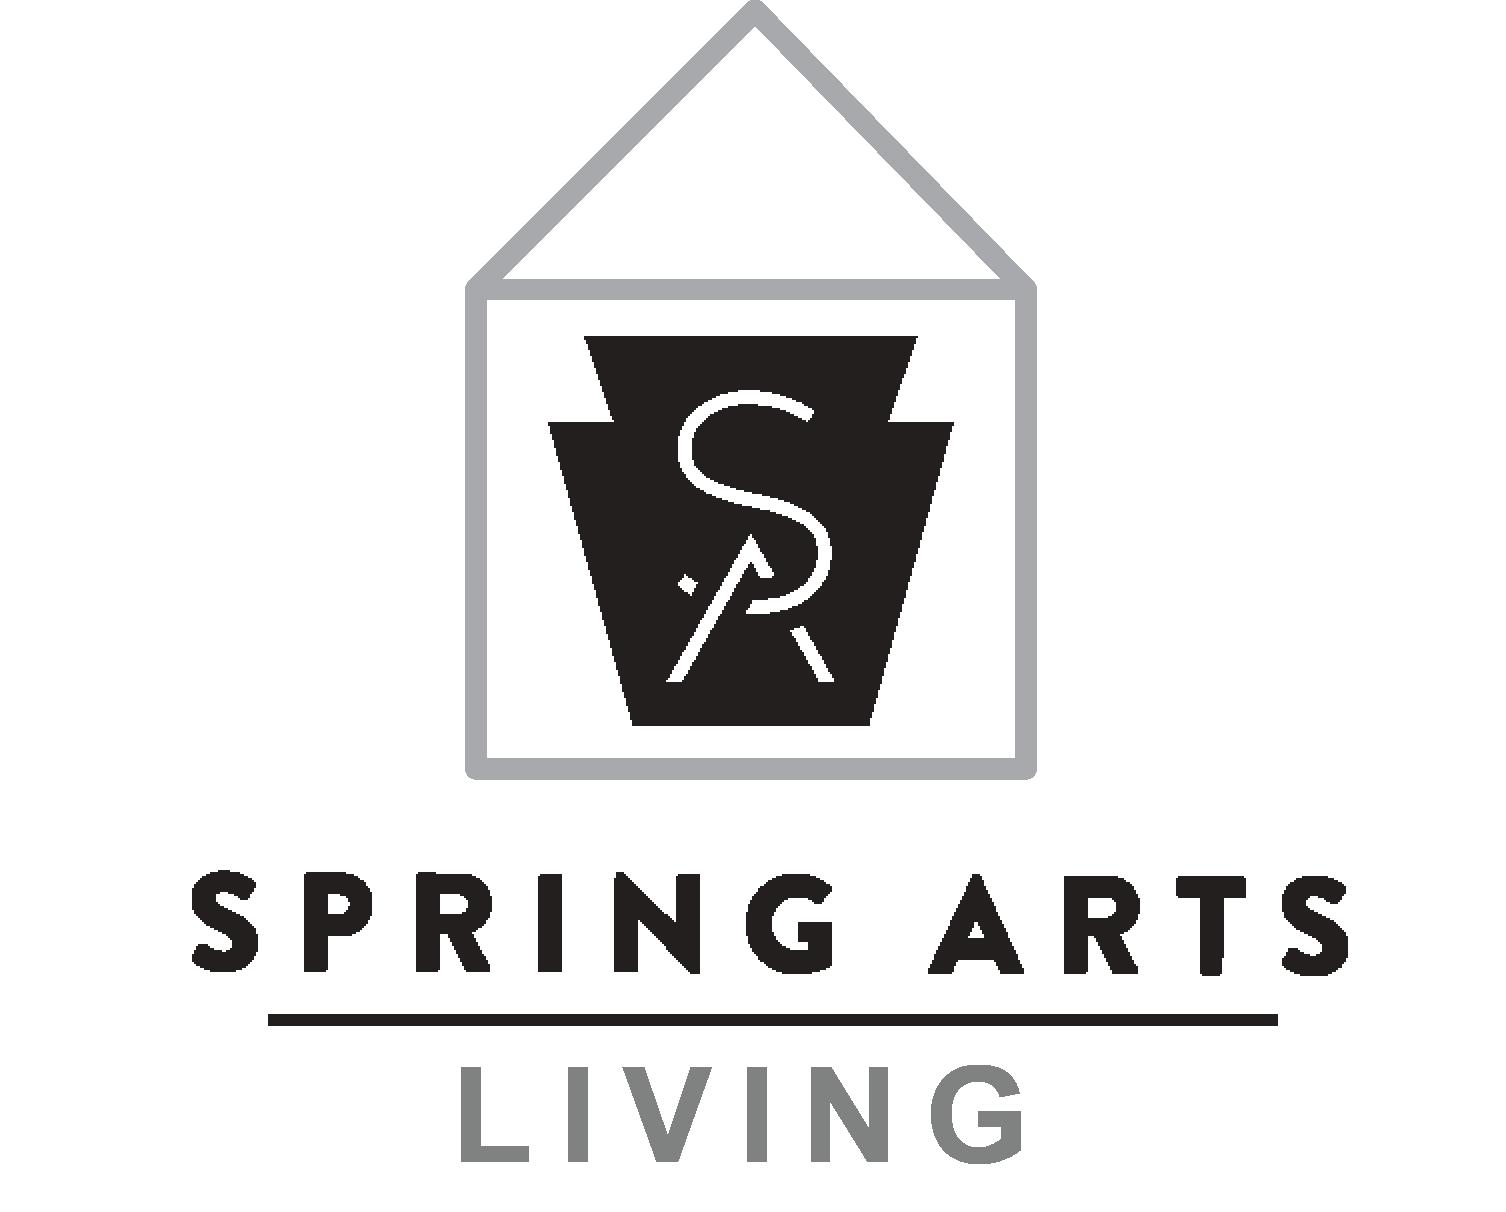 Spring Arts Living